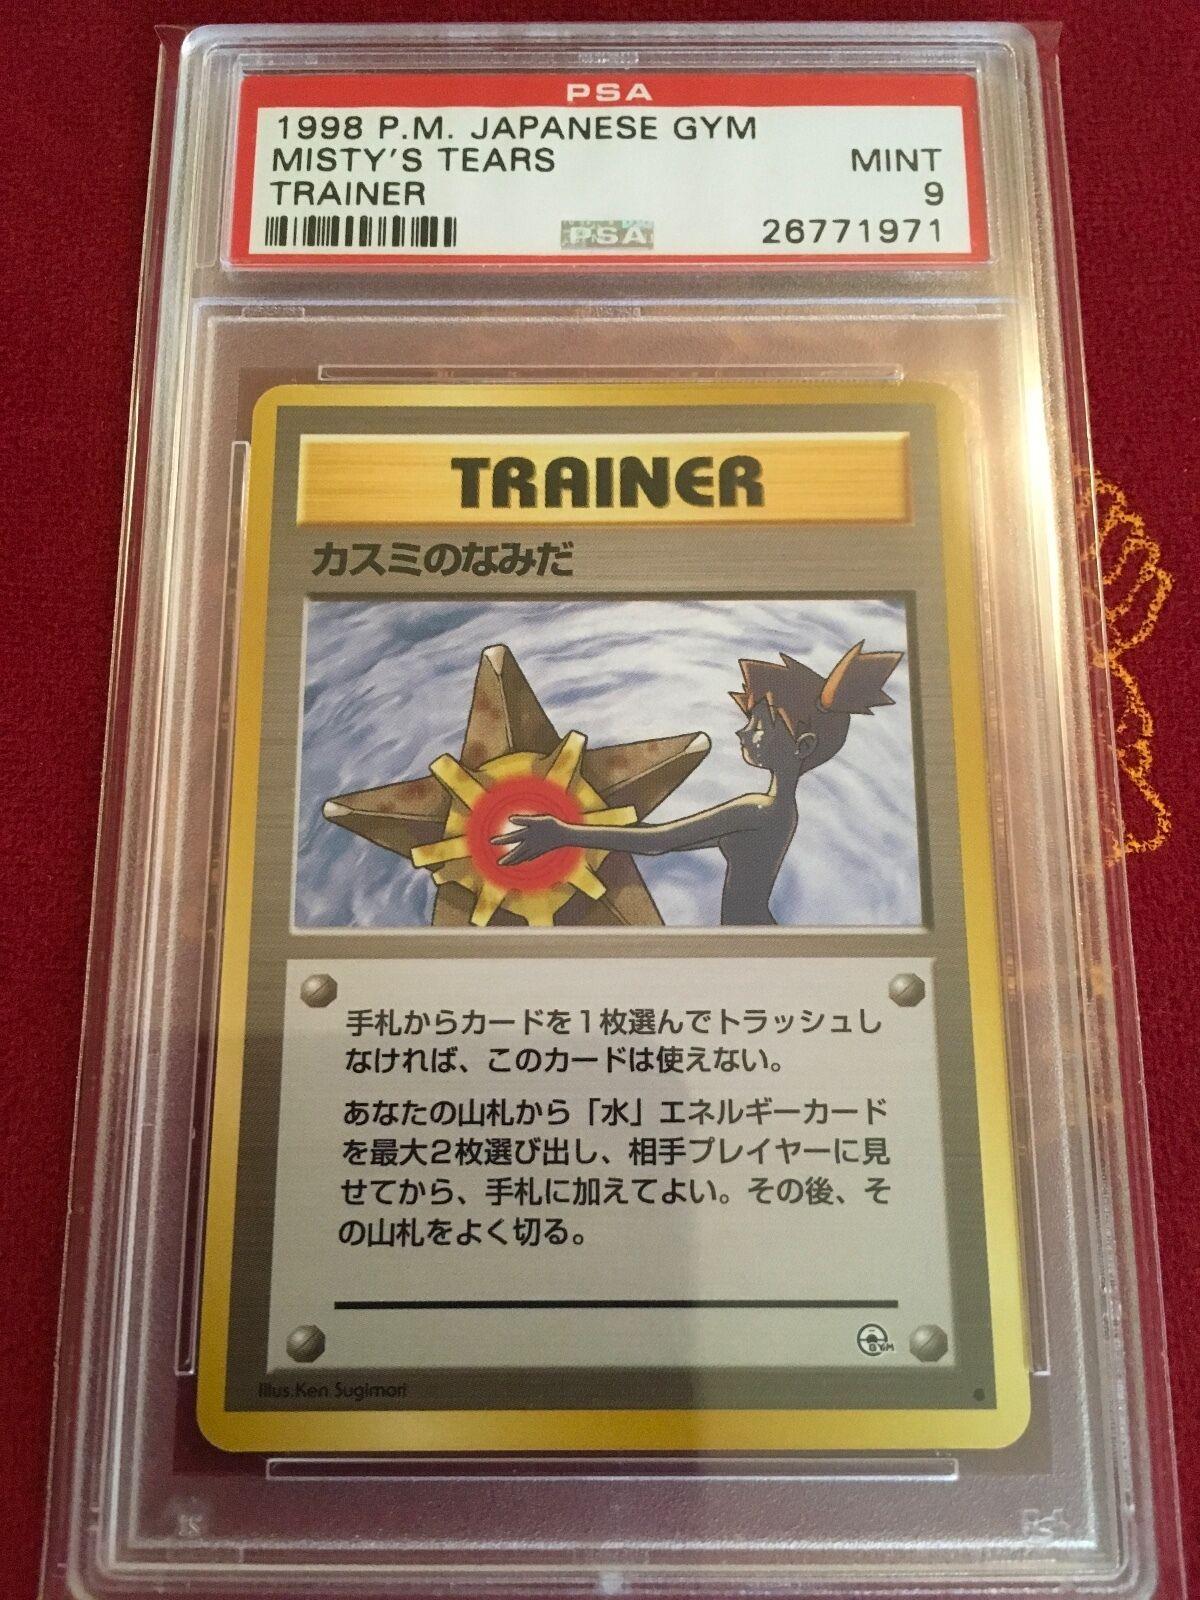 Pokémon Japanese Gym Misty's Tears Trainer Altered Art PSA 9